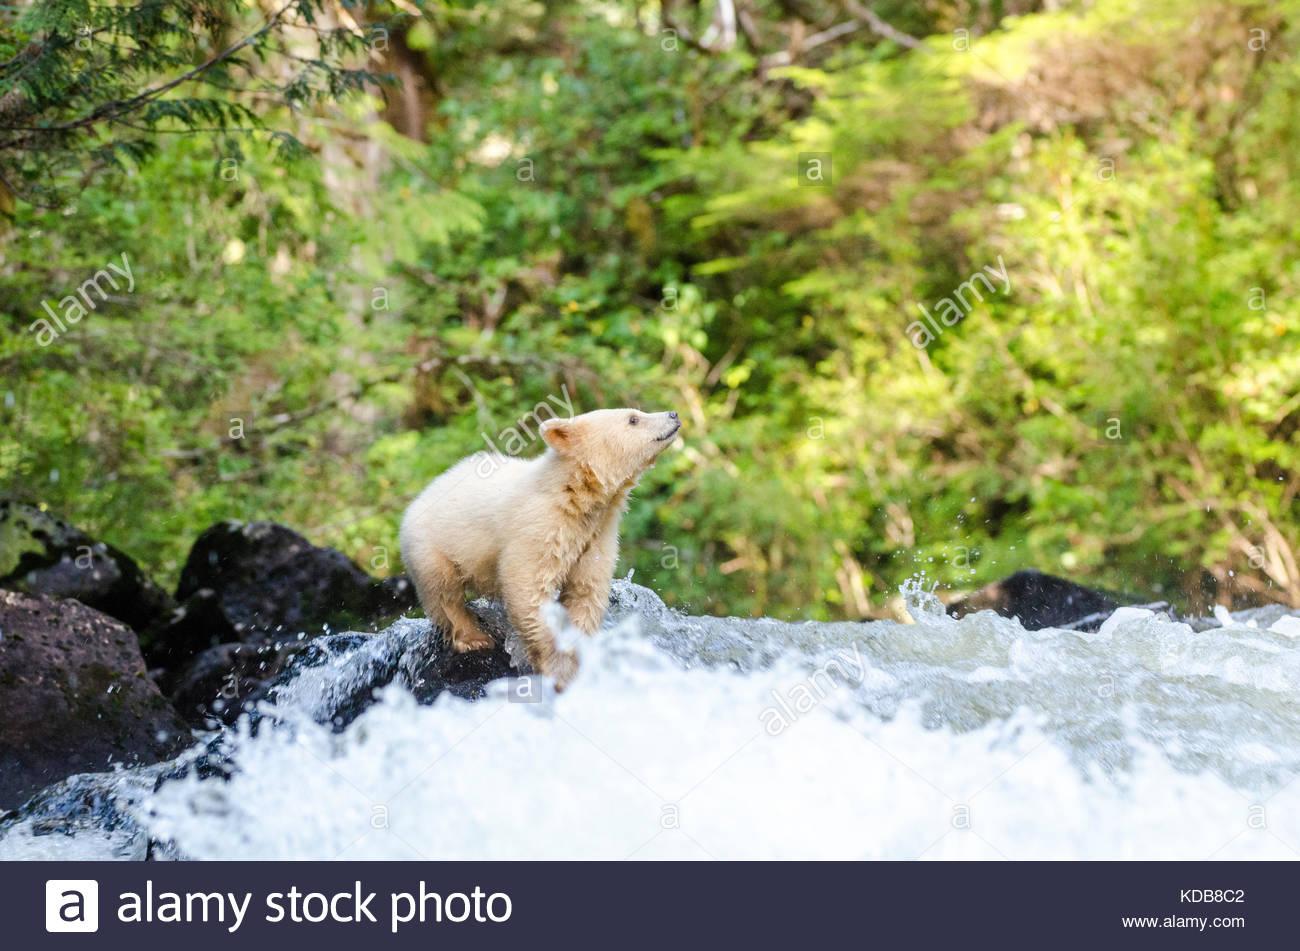 A spirit bear cub, Ursus americanus kermodei, tries to cross a rushing stream. - Stock Image